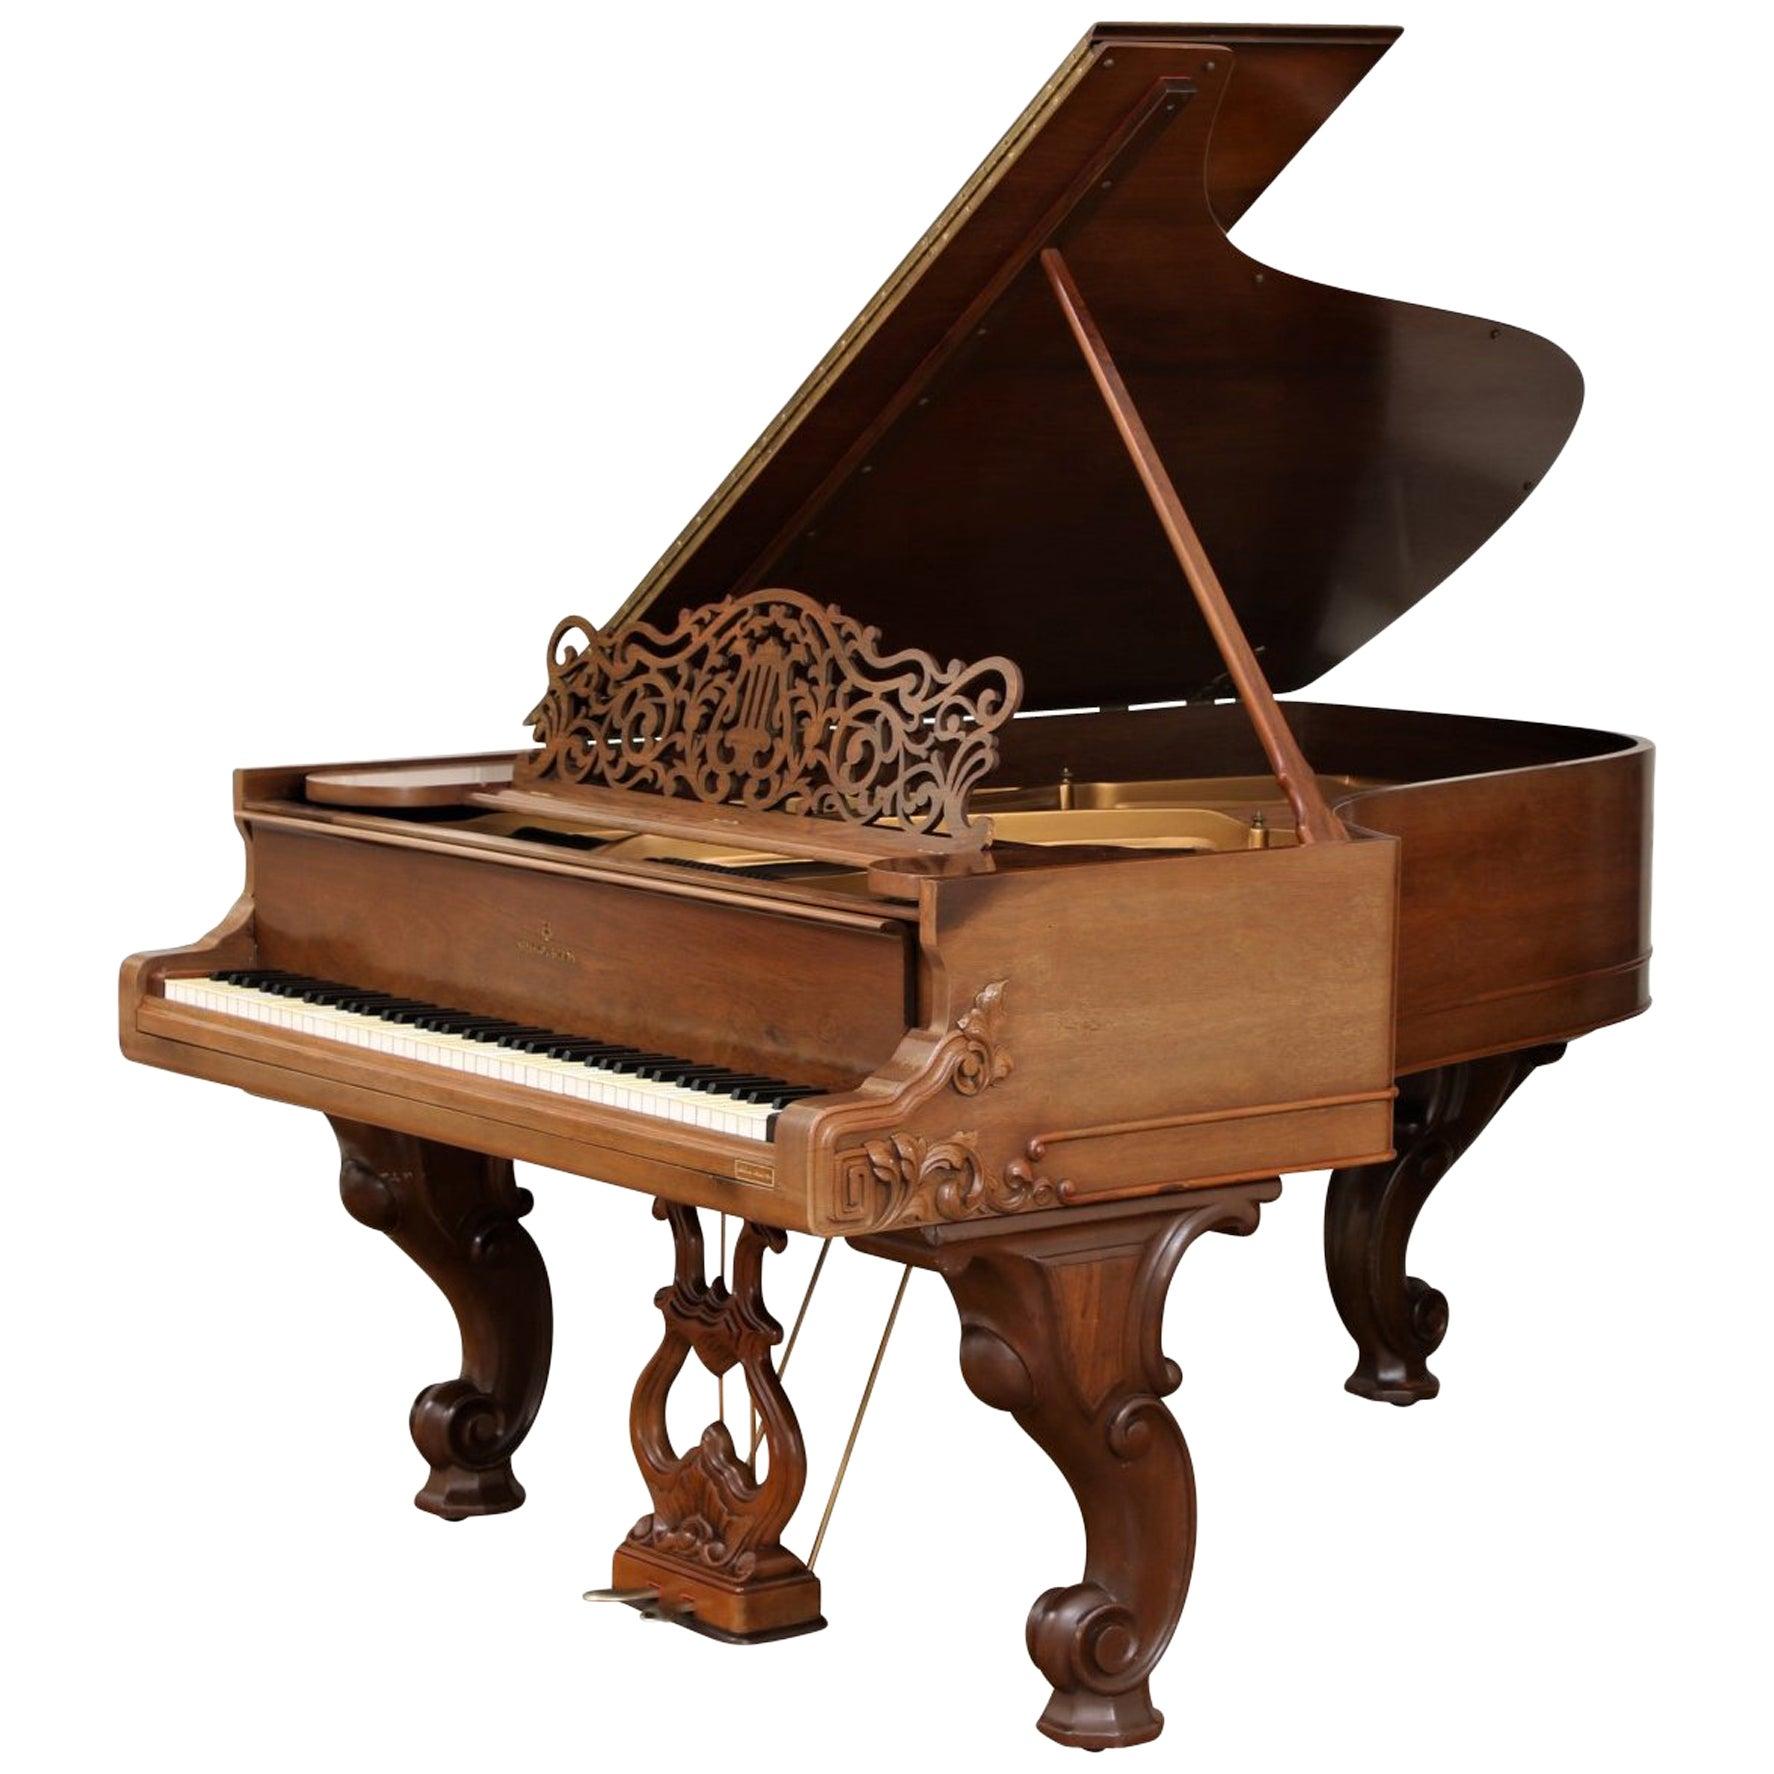 85 Key Antique Steinway Grand Piano, circa 1873